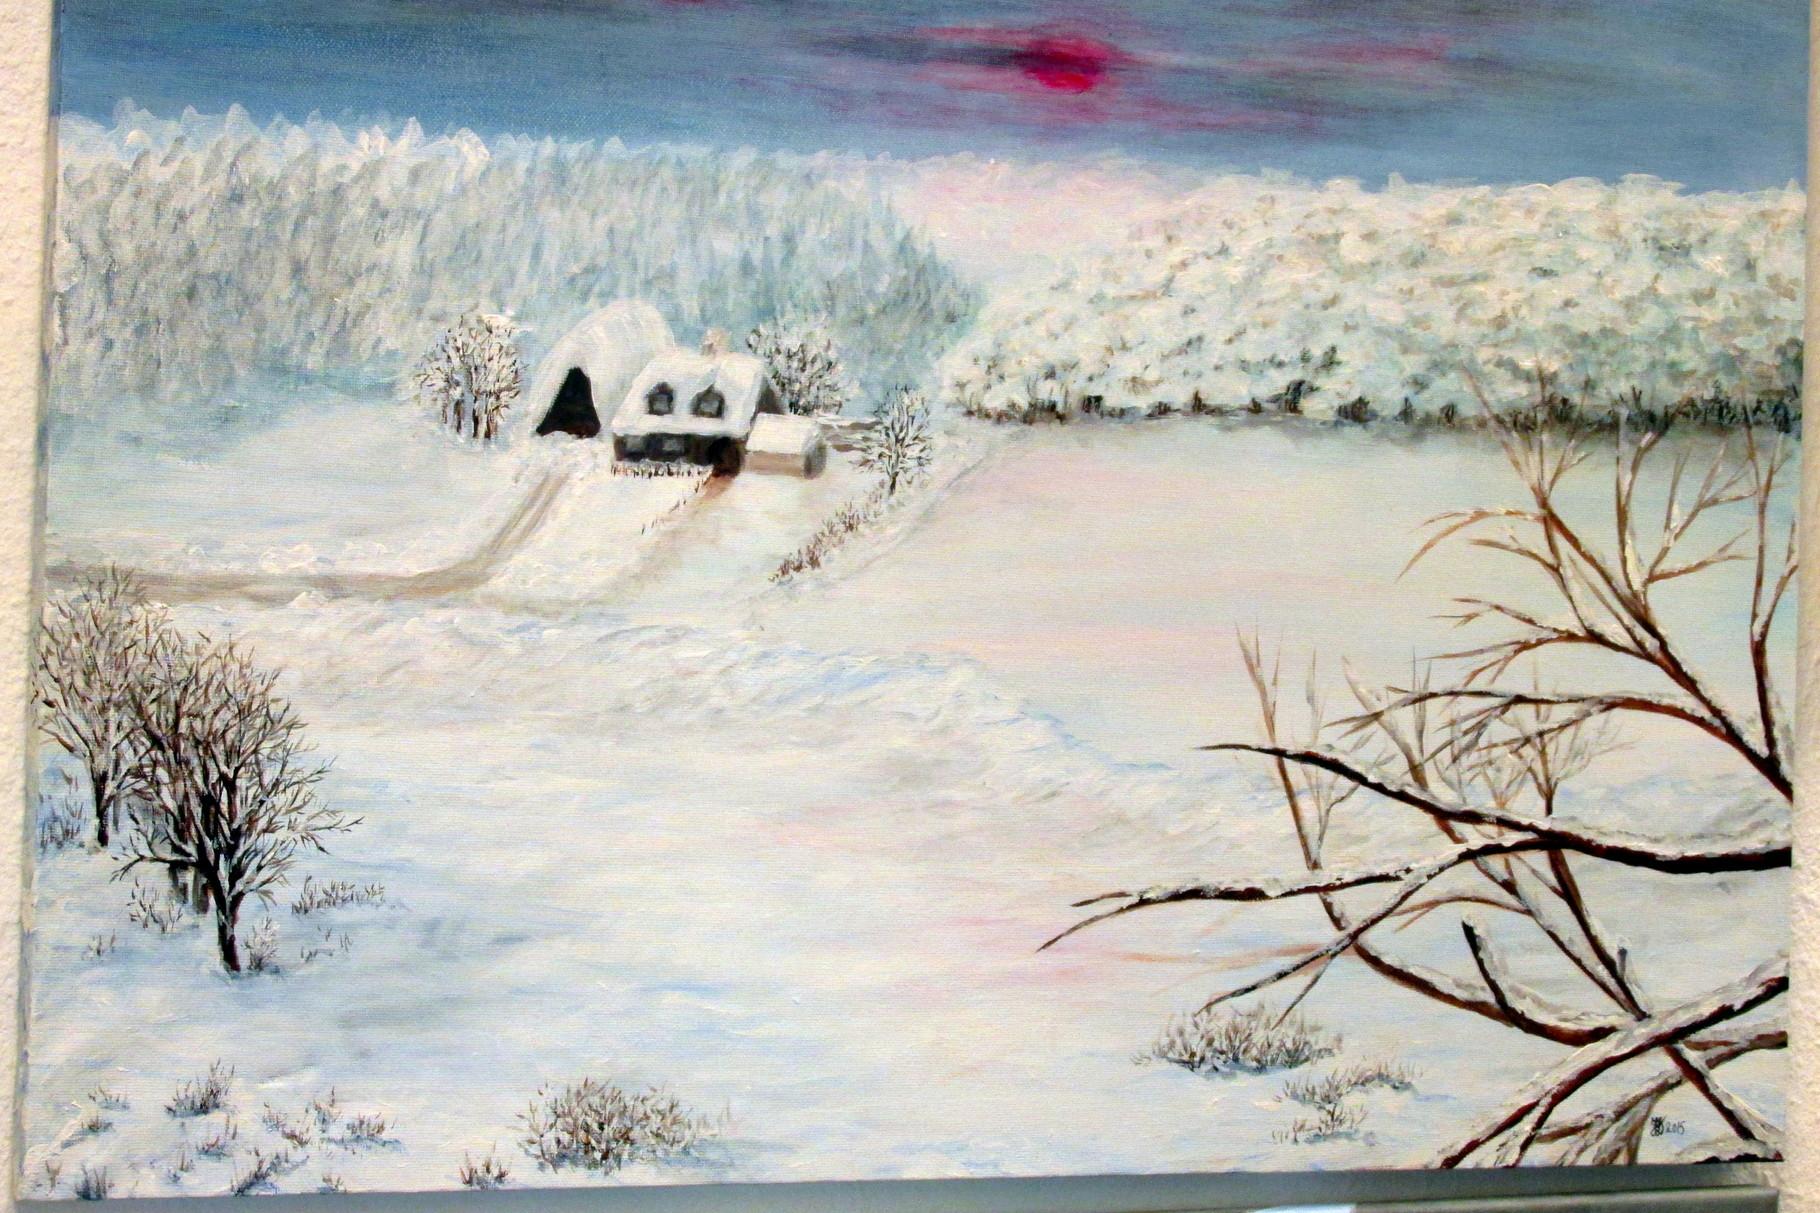 Winter auf dem Land,Acryl a. L. gerahmt, 50x70cm, 280 €